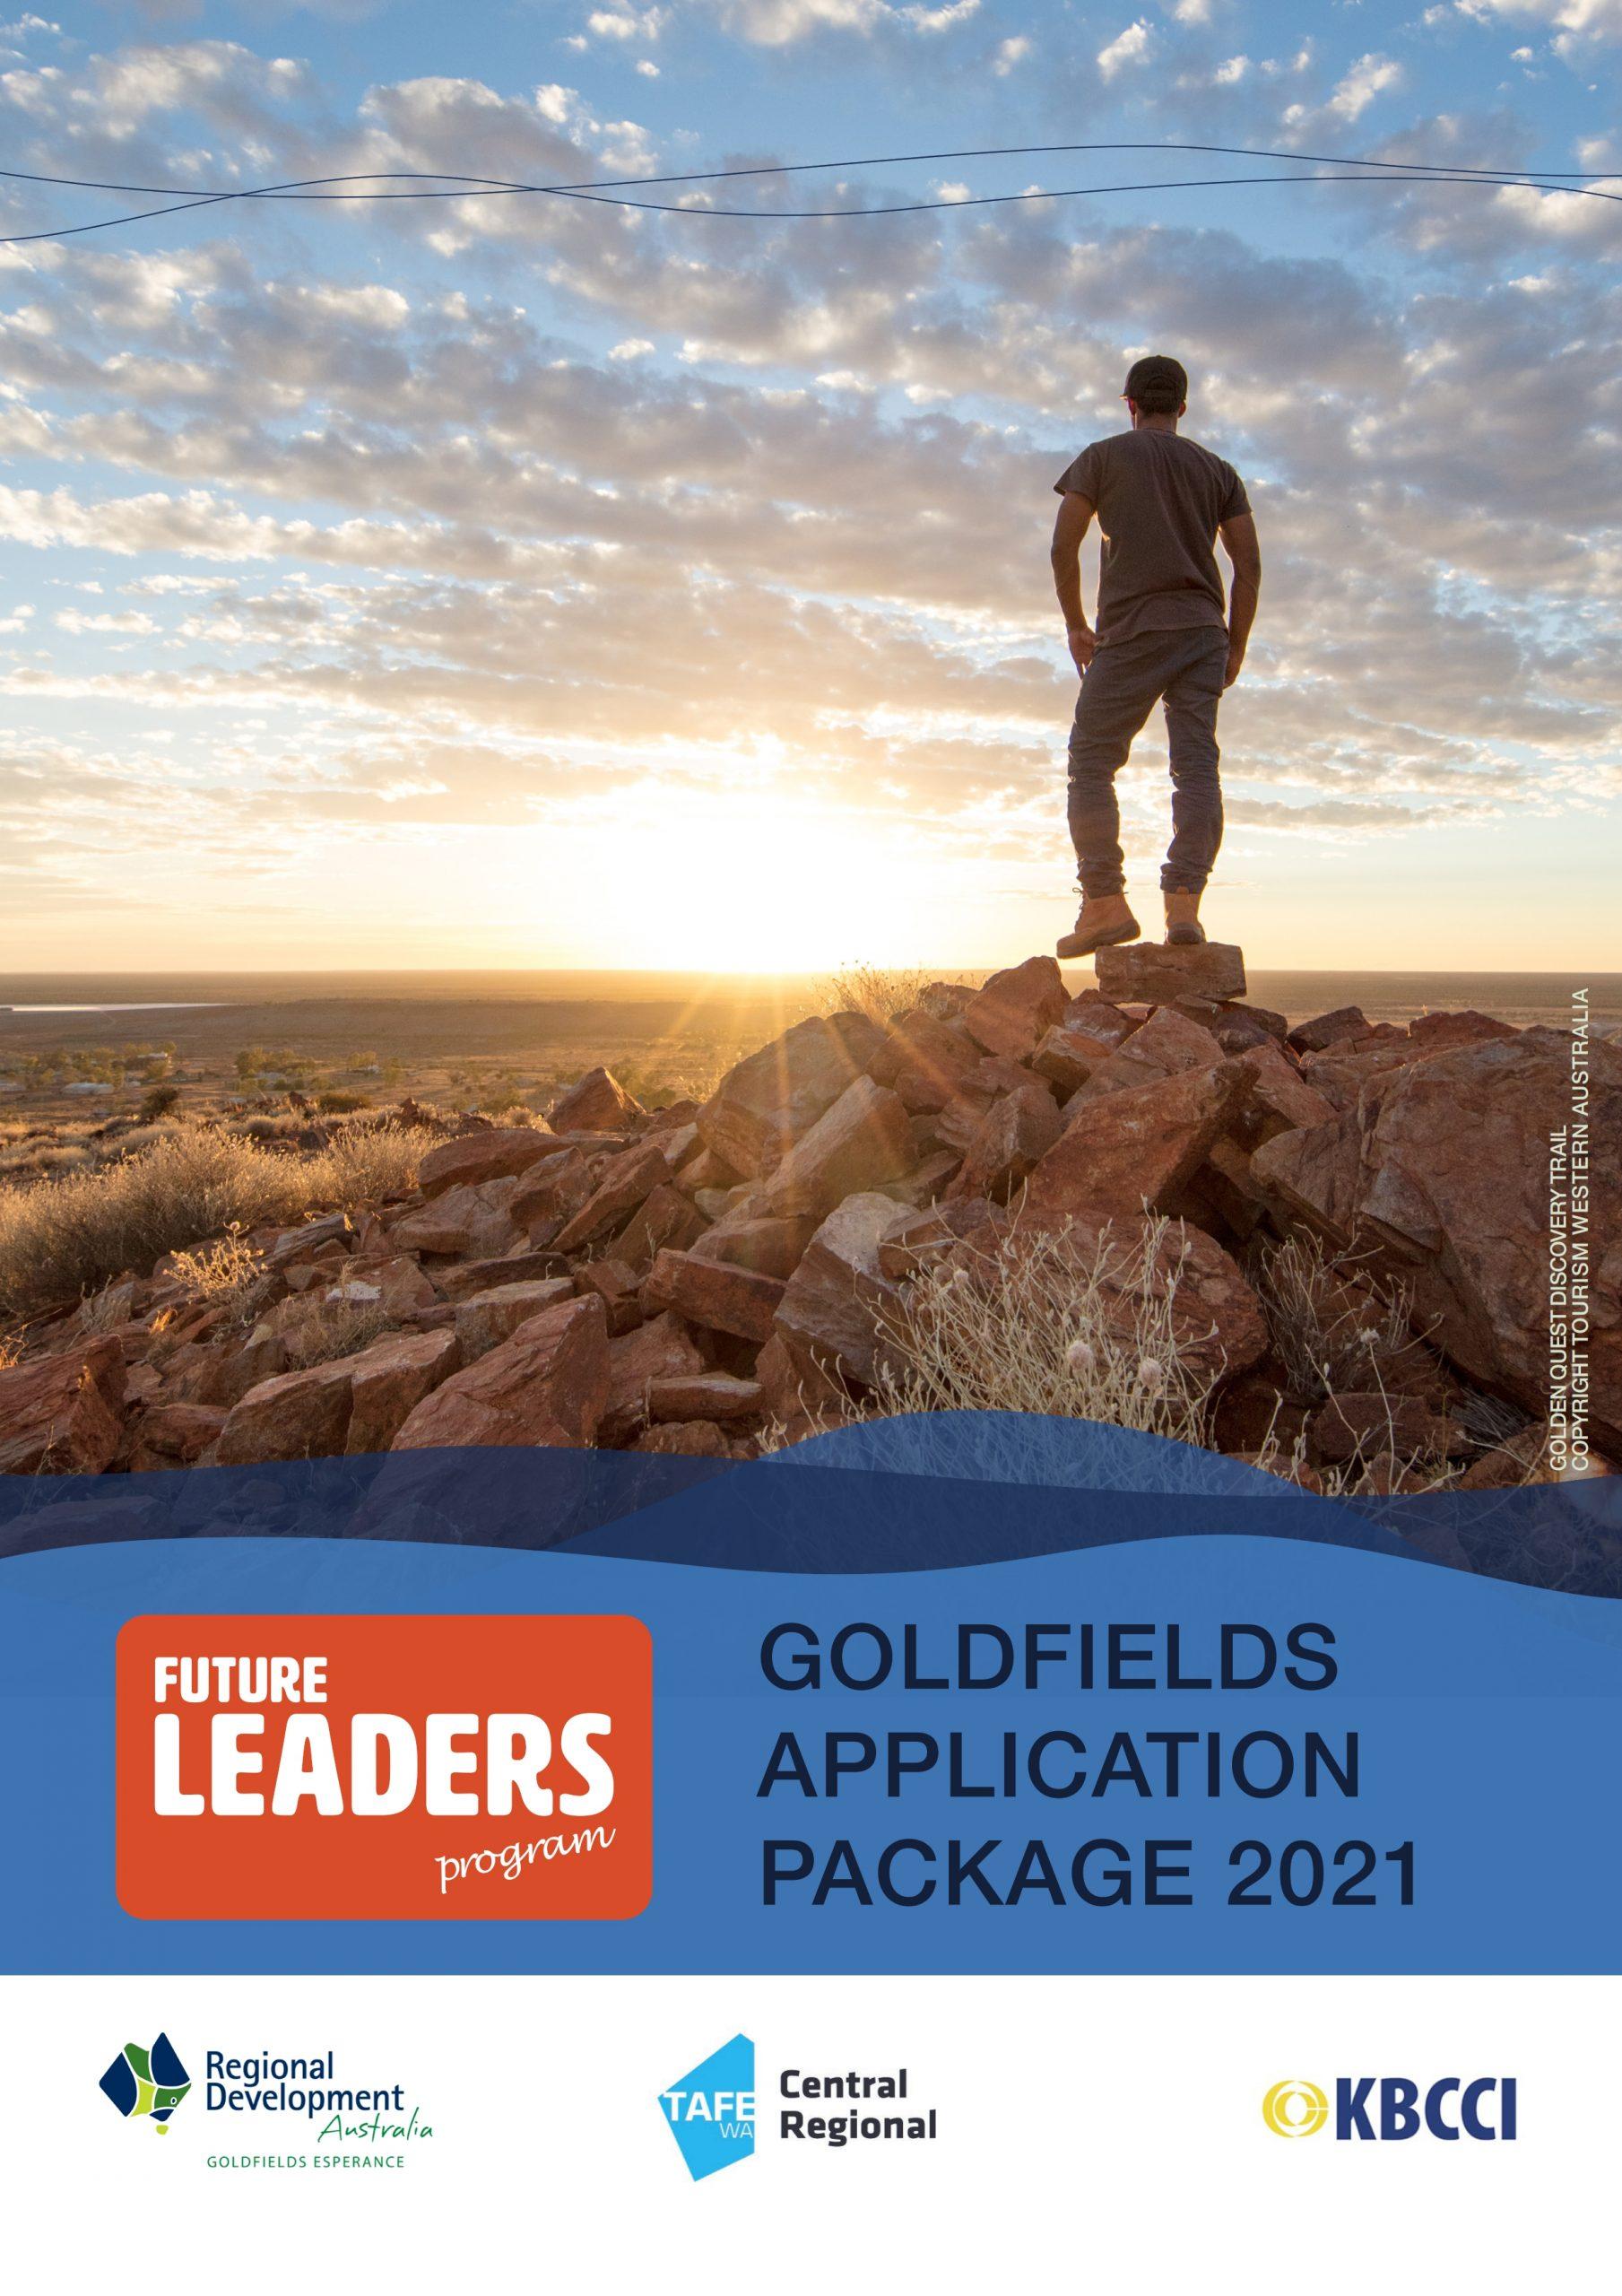 FLP Goldfields Application Package 2021_001